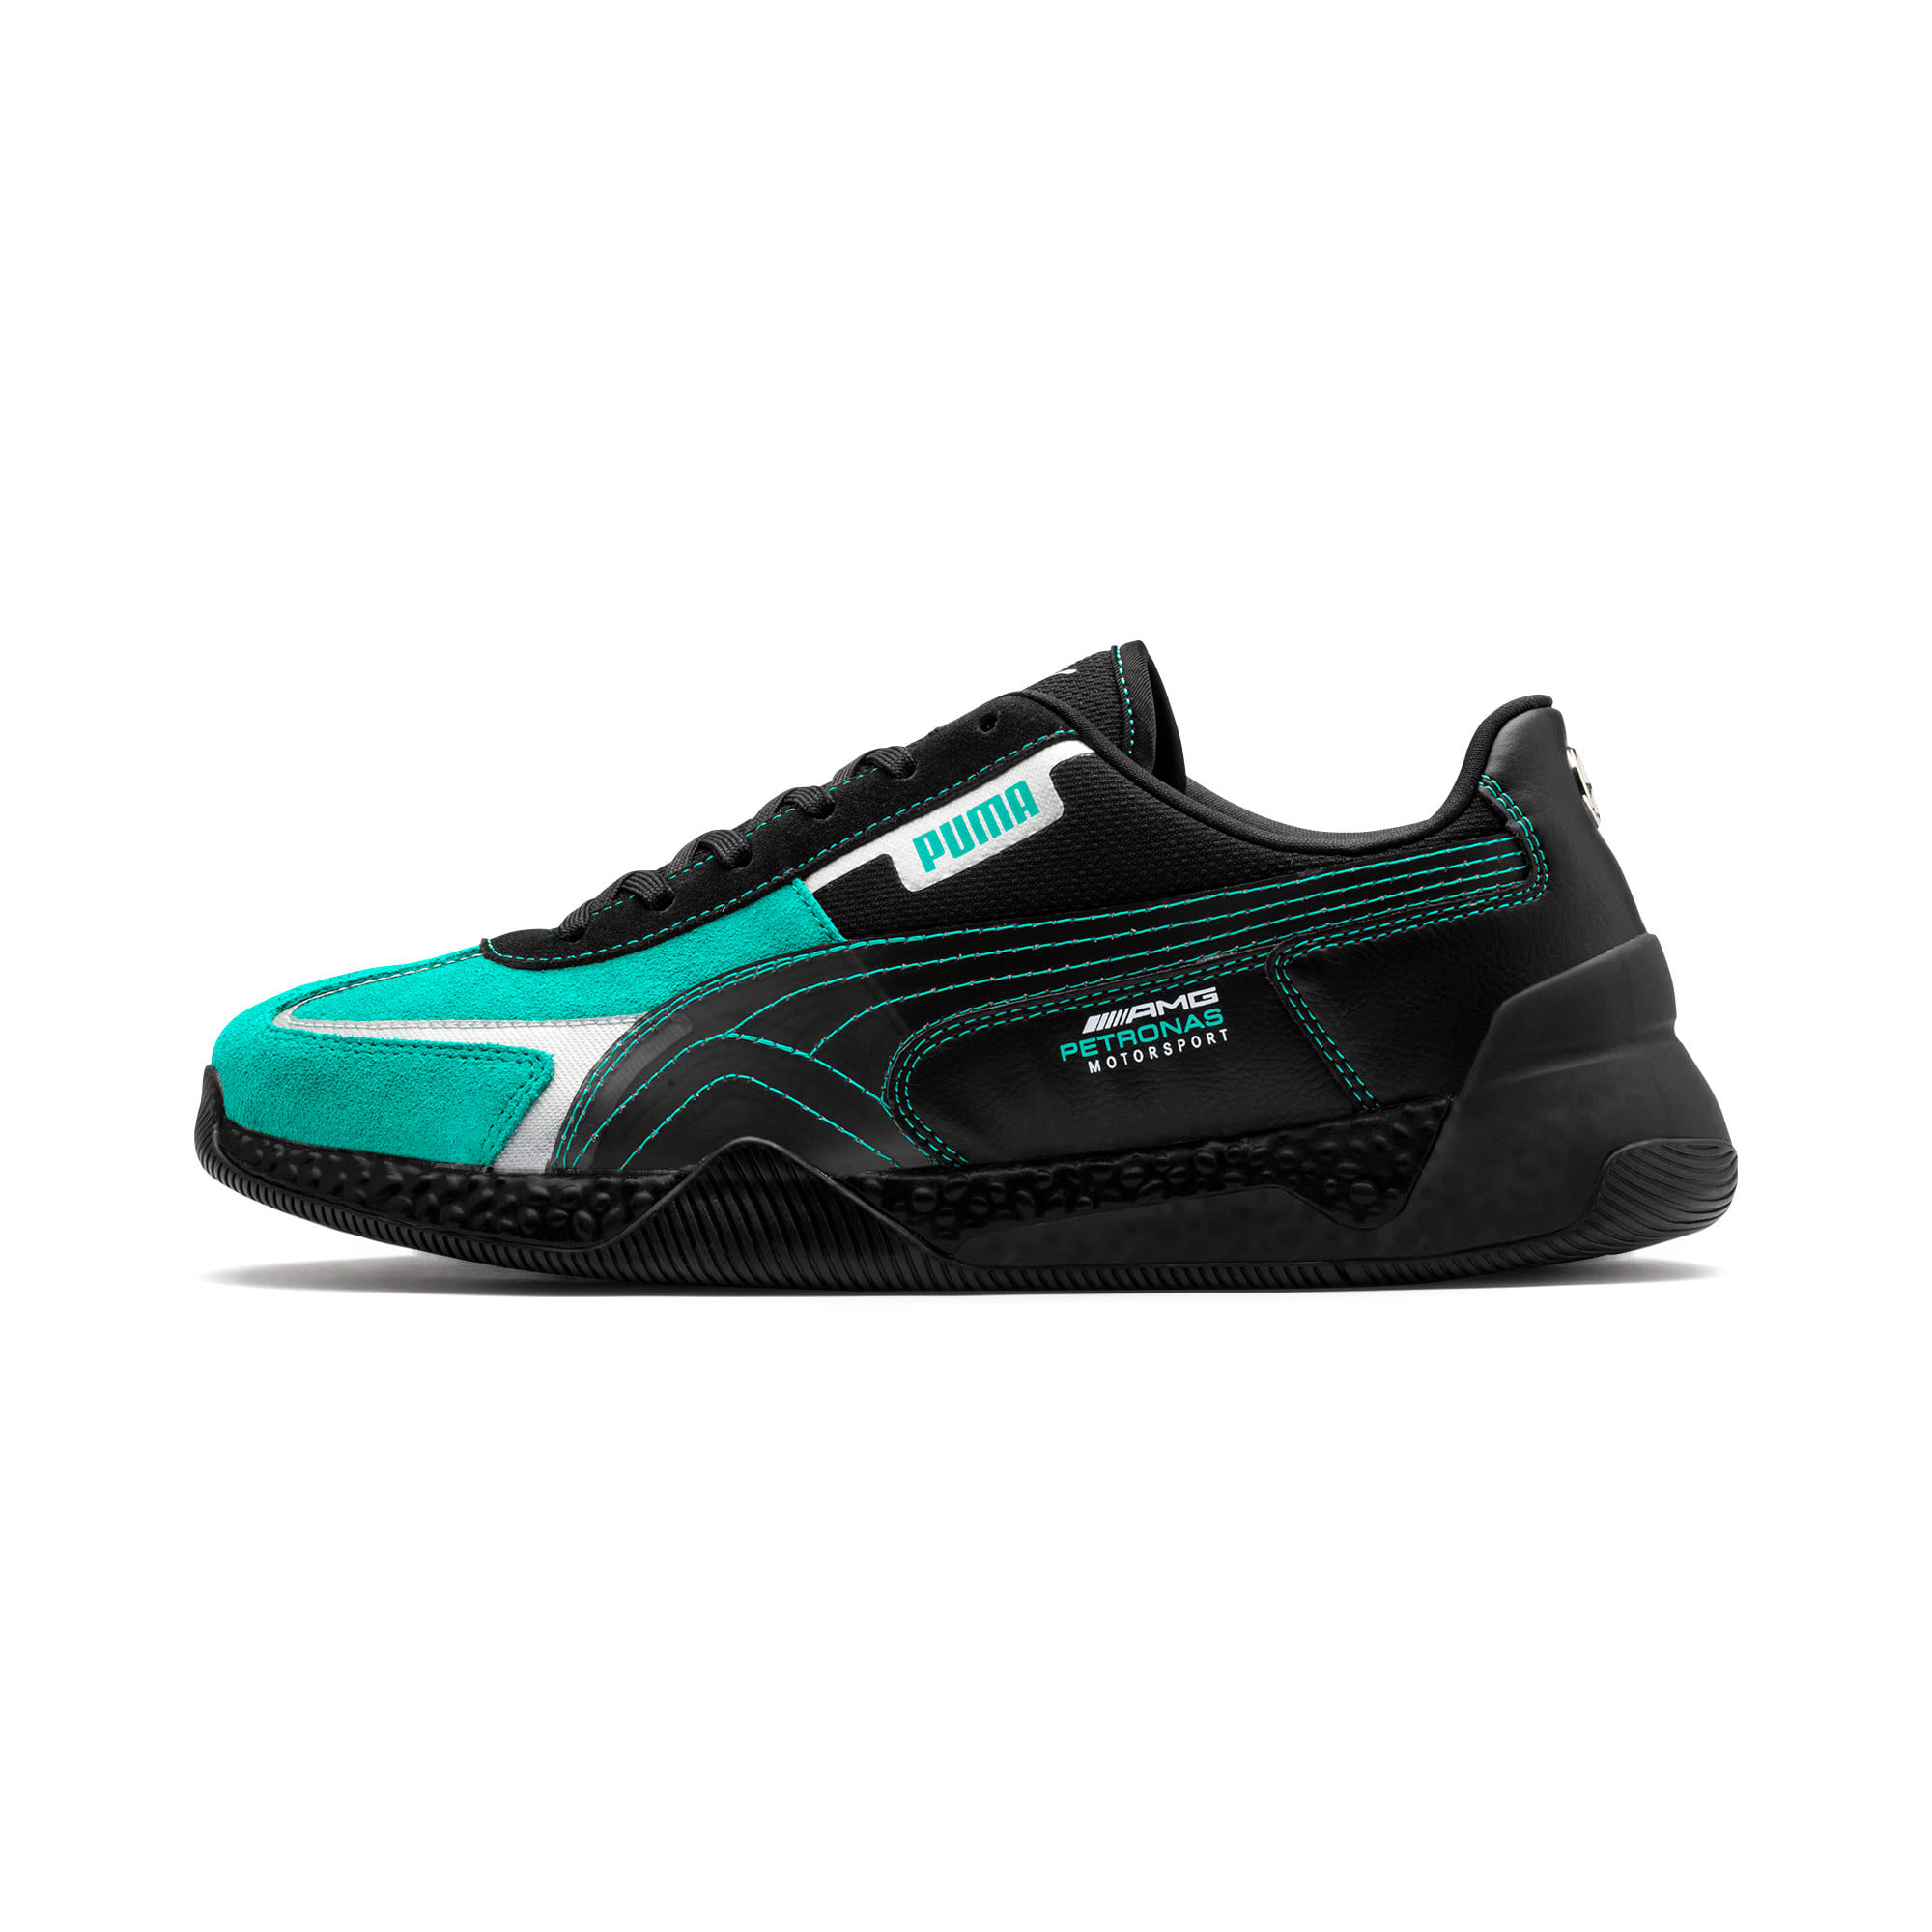 Thumbnail 1 of Mercedes AMG Petronas Motorsport Speed HYBRID Men's Trainers, Puma Black-Spectra Green, medium